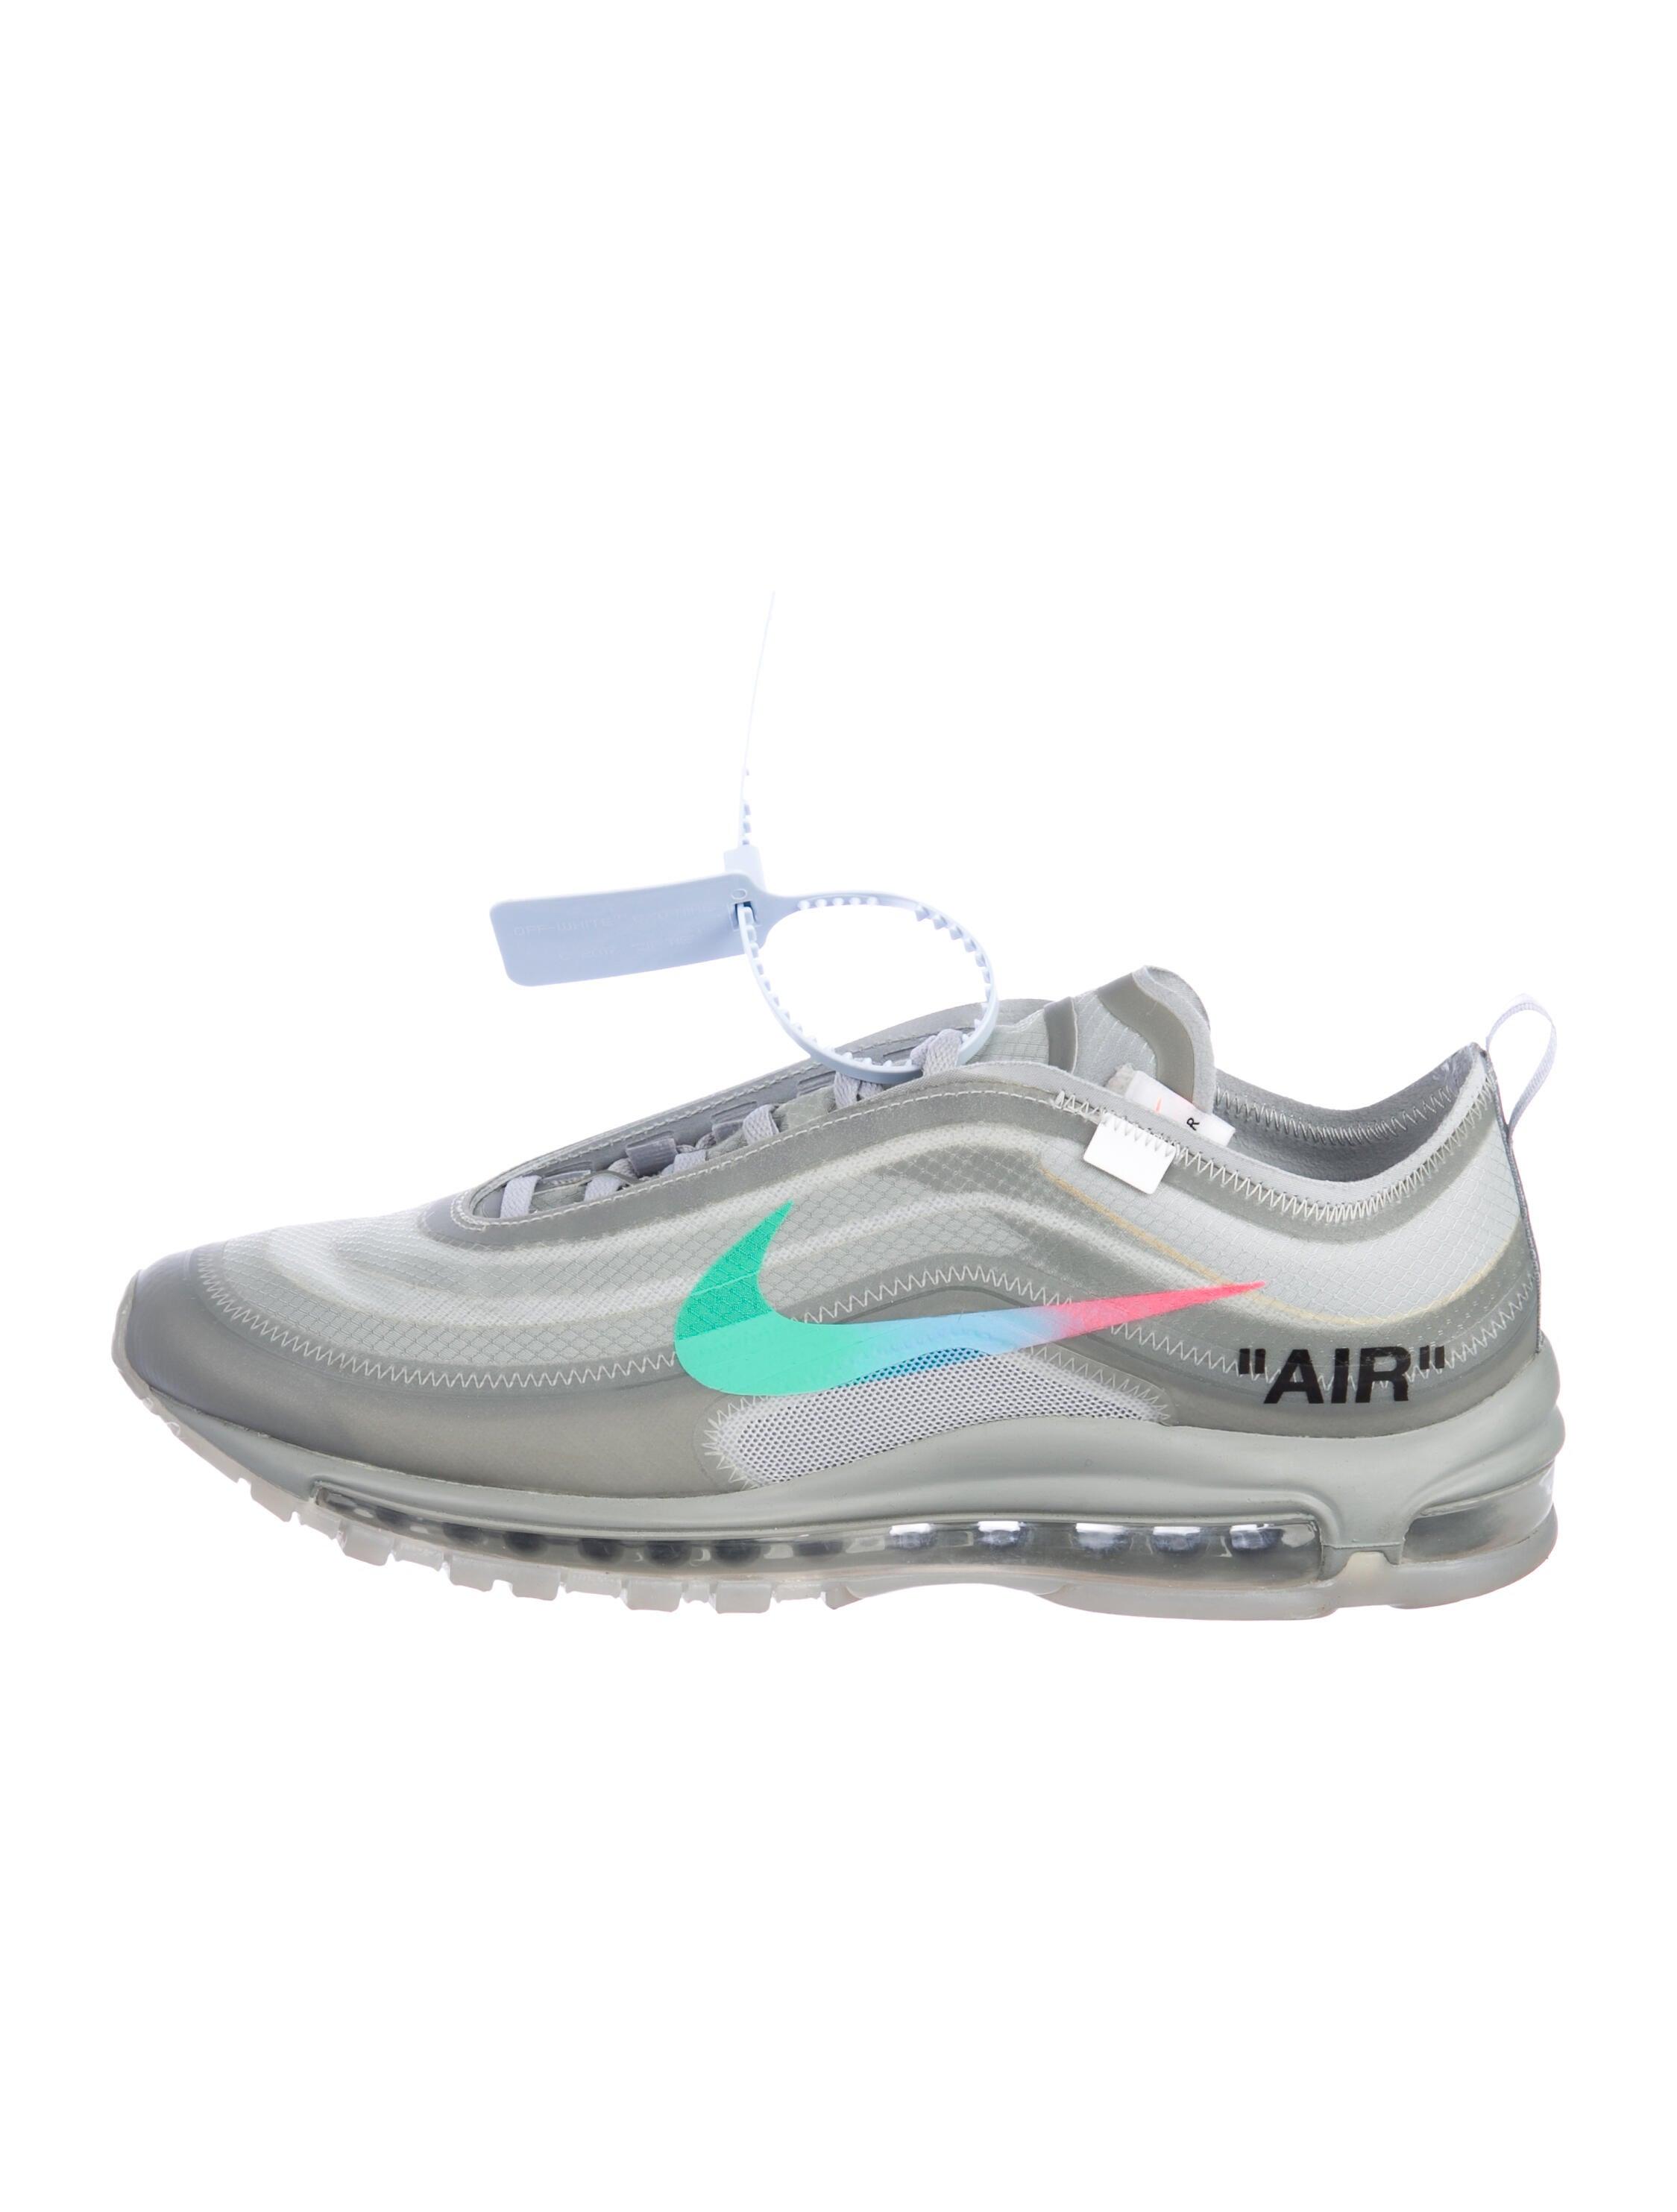 Off White x Nike | The RealReal